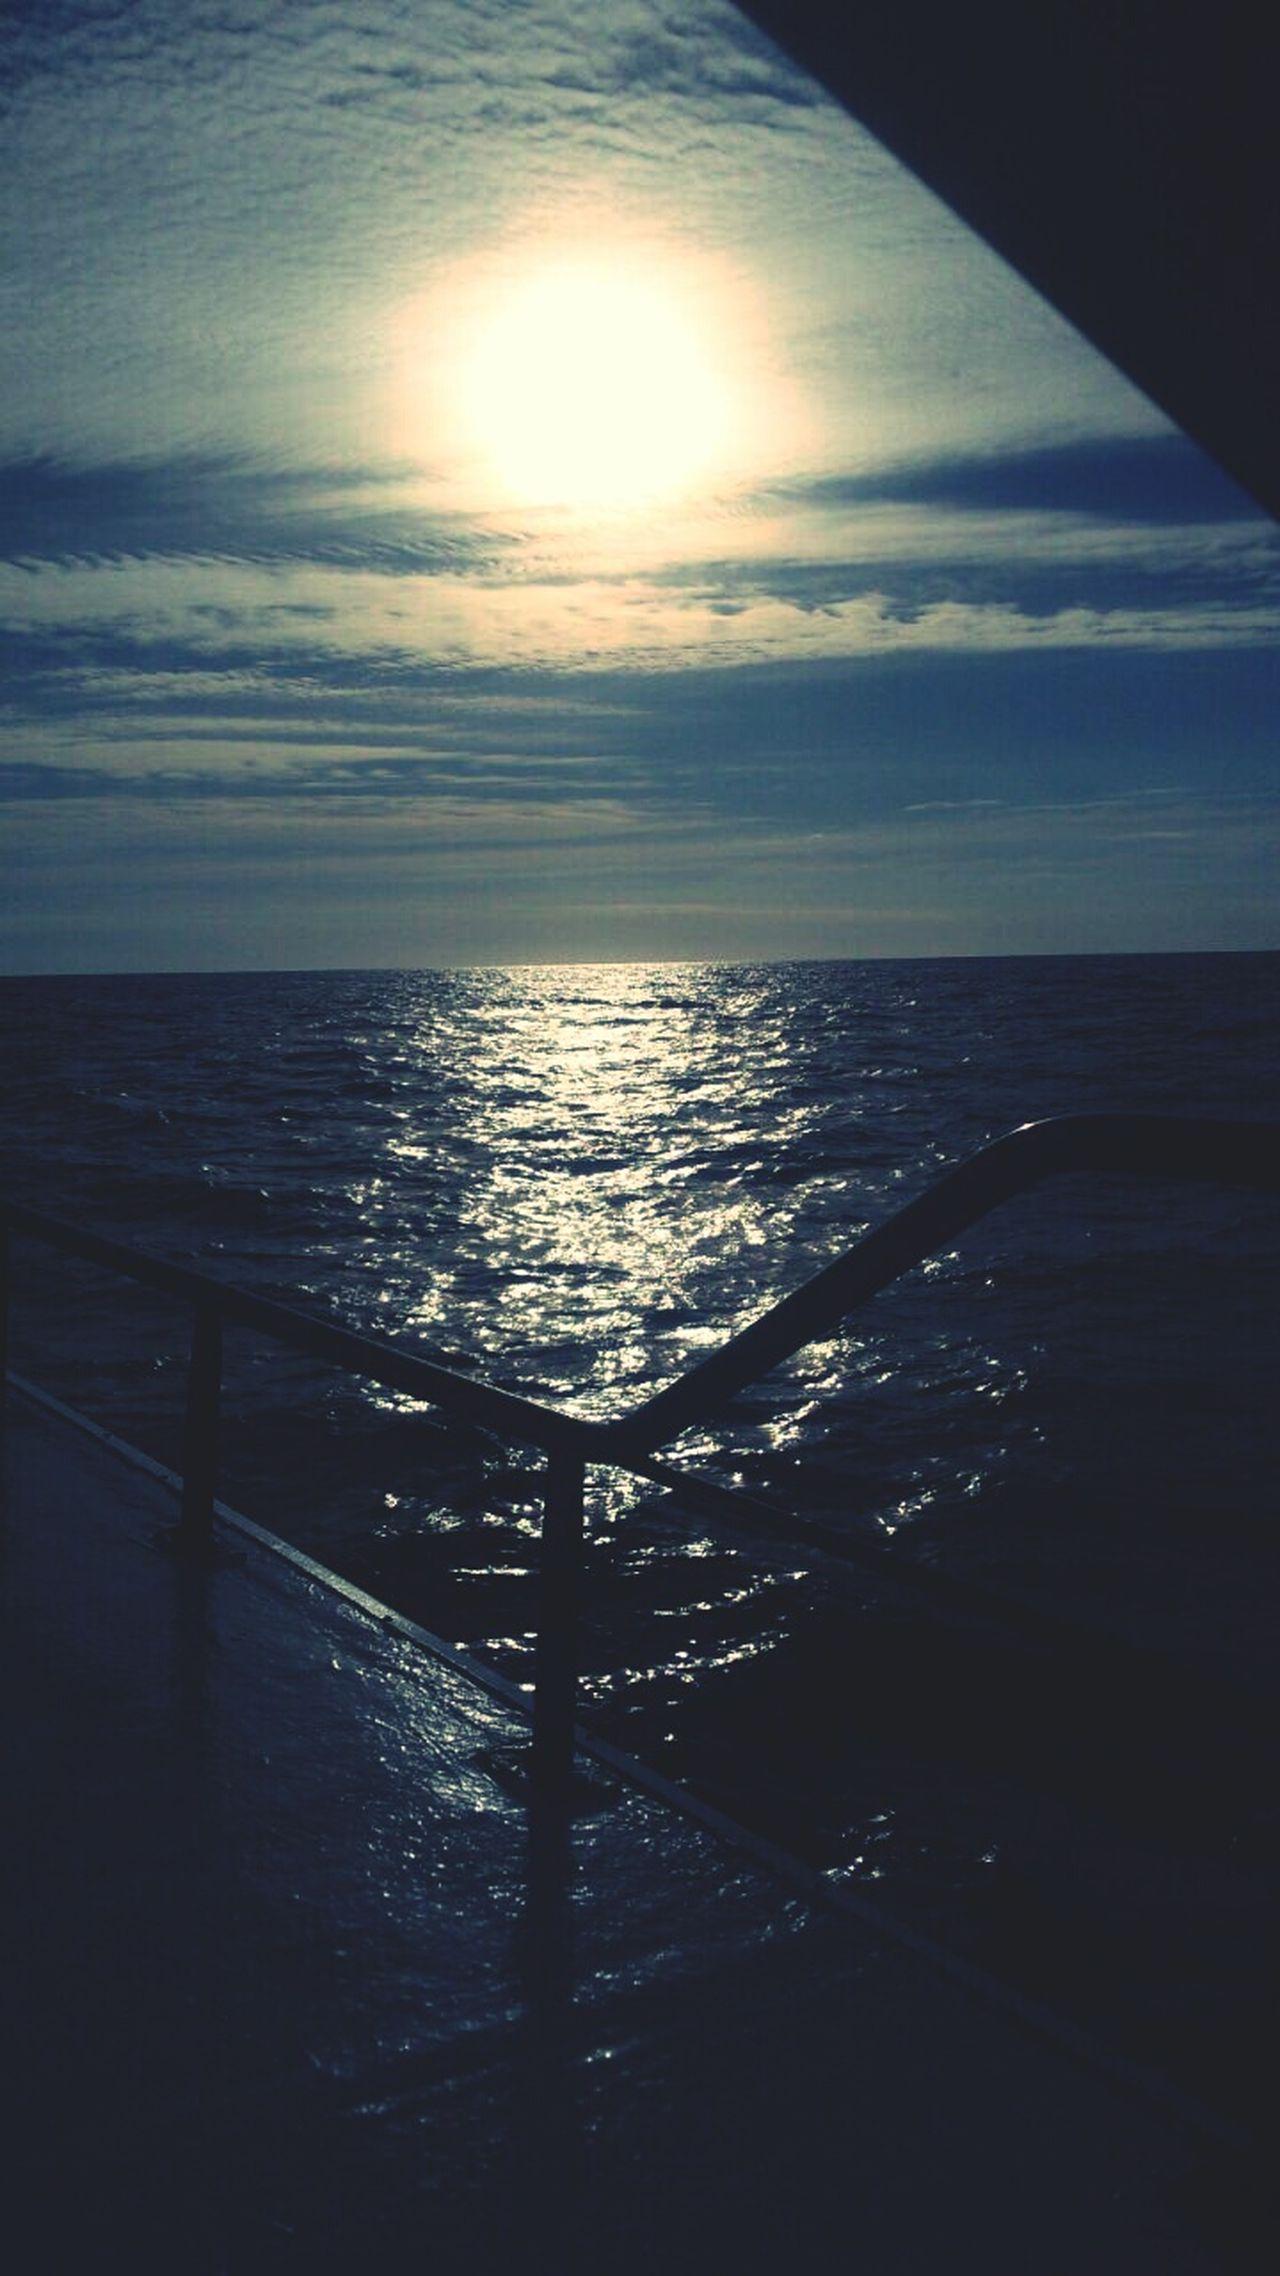 Effect Natural Photography Photo Ship Navigate Nautical Vessel Design Arts Ships⚓️⛵️🚢 EyeEm Nature Horizon